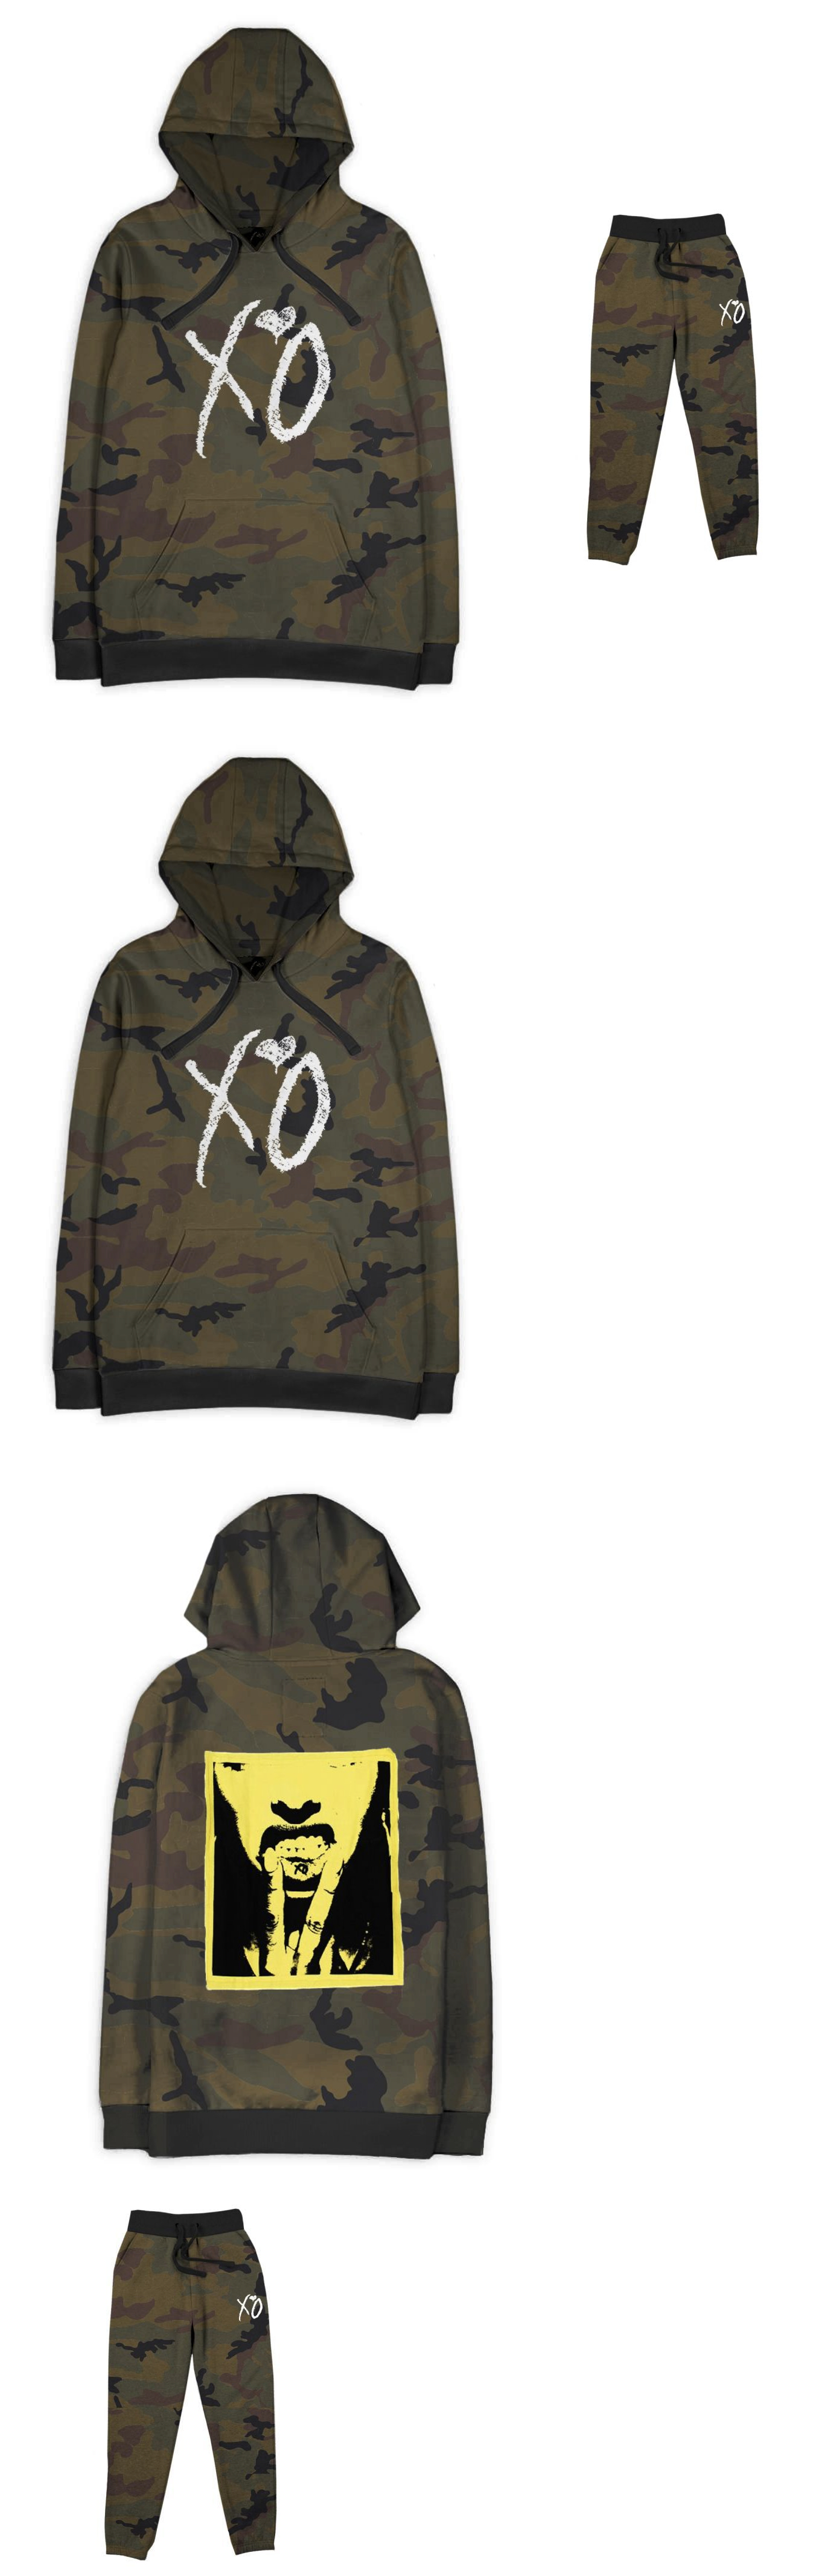 e73f96c6 Mixed Items And Lots 84434 The Weeknd Camo Xo Lip Fleece Pullover